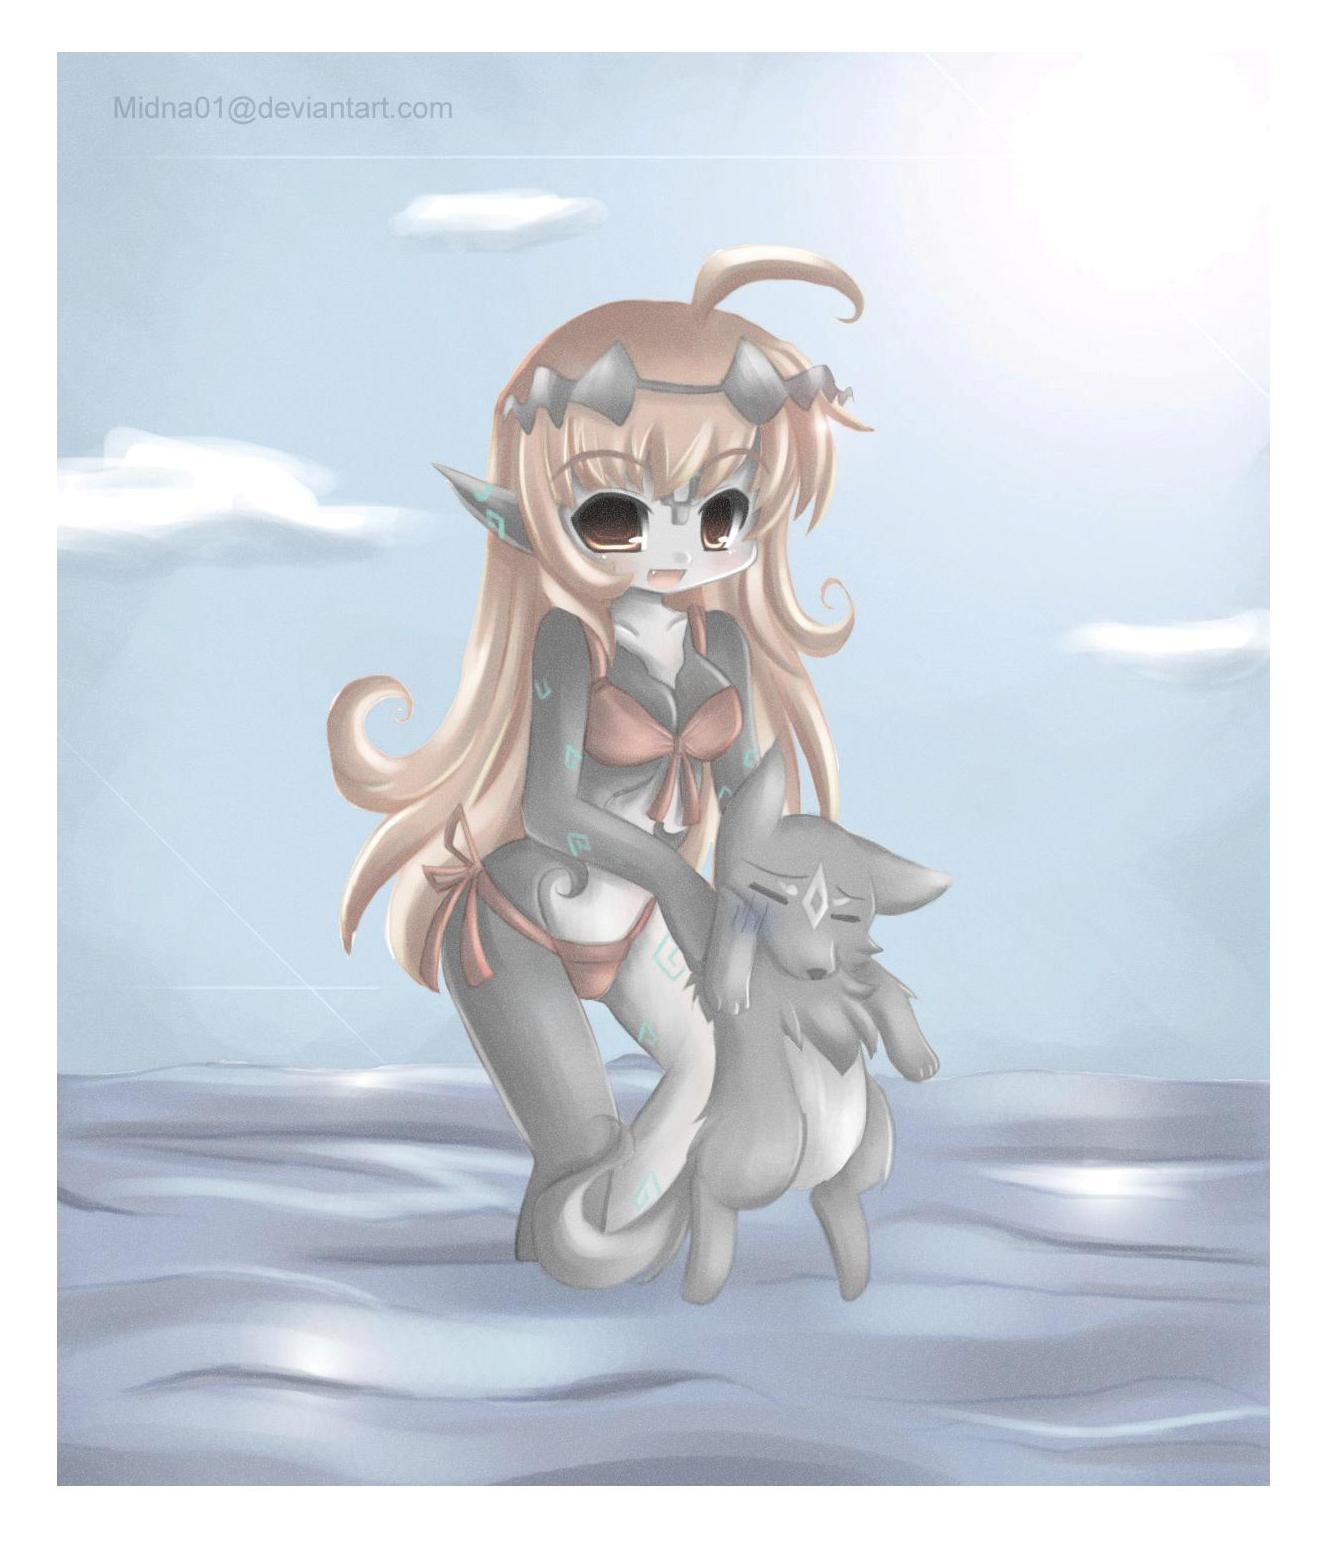 1girl 1other ahoge animal bikini blush clouds cute deviantart_username fang link mammal midna midna01 moe nintendo nintendo_ead outdoors pointy_ears red_bikini sky swimsuit the_legend_of_zelda the_legend_of_zelda:_twilight_princess water web_address wolf wolf_link